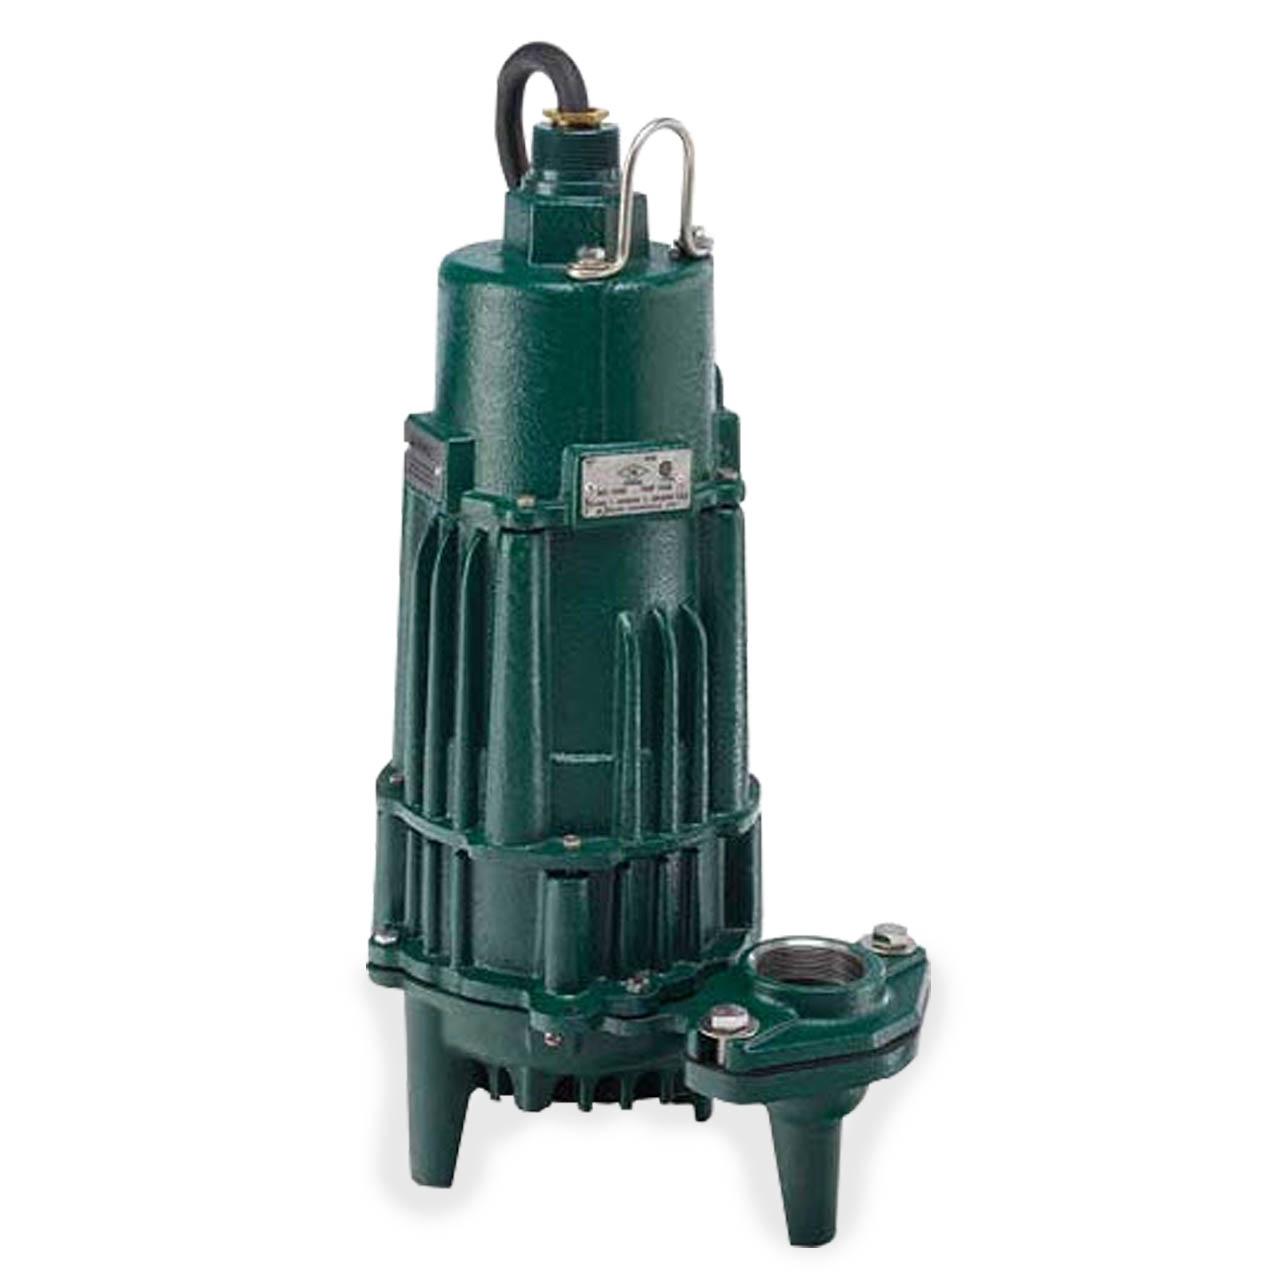 hight resolution of zoeller zoeller 282 0049 model nx282 explosion proof pump 0 5 hp 115v 1ph 20 cord nonautomatic zlr282 0049